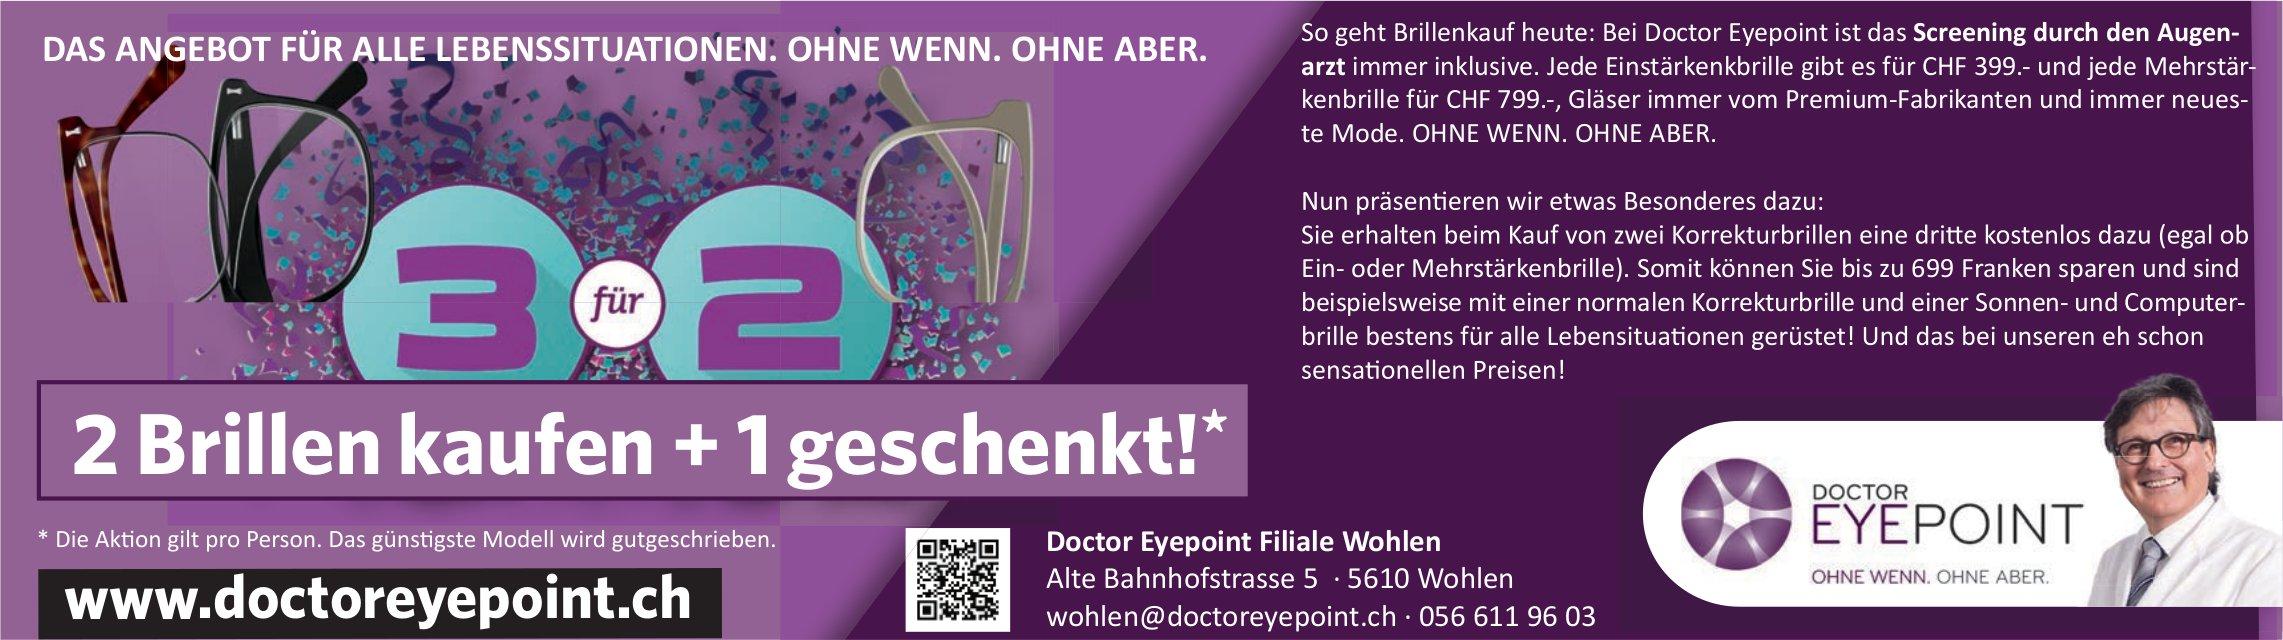 Doctor Eyepoint in Wohlen